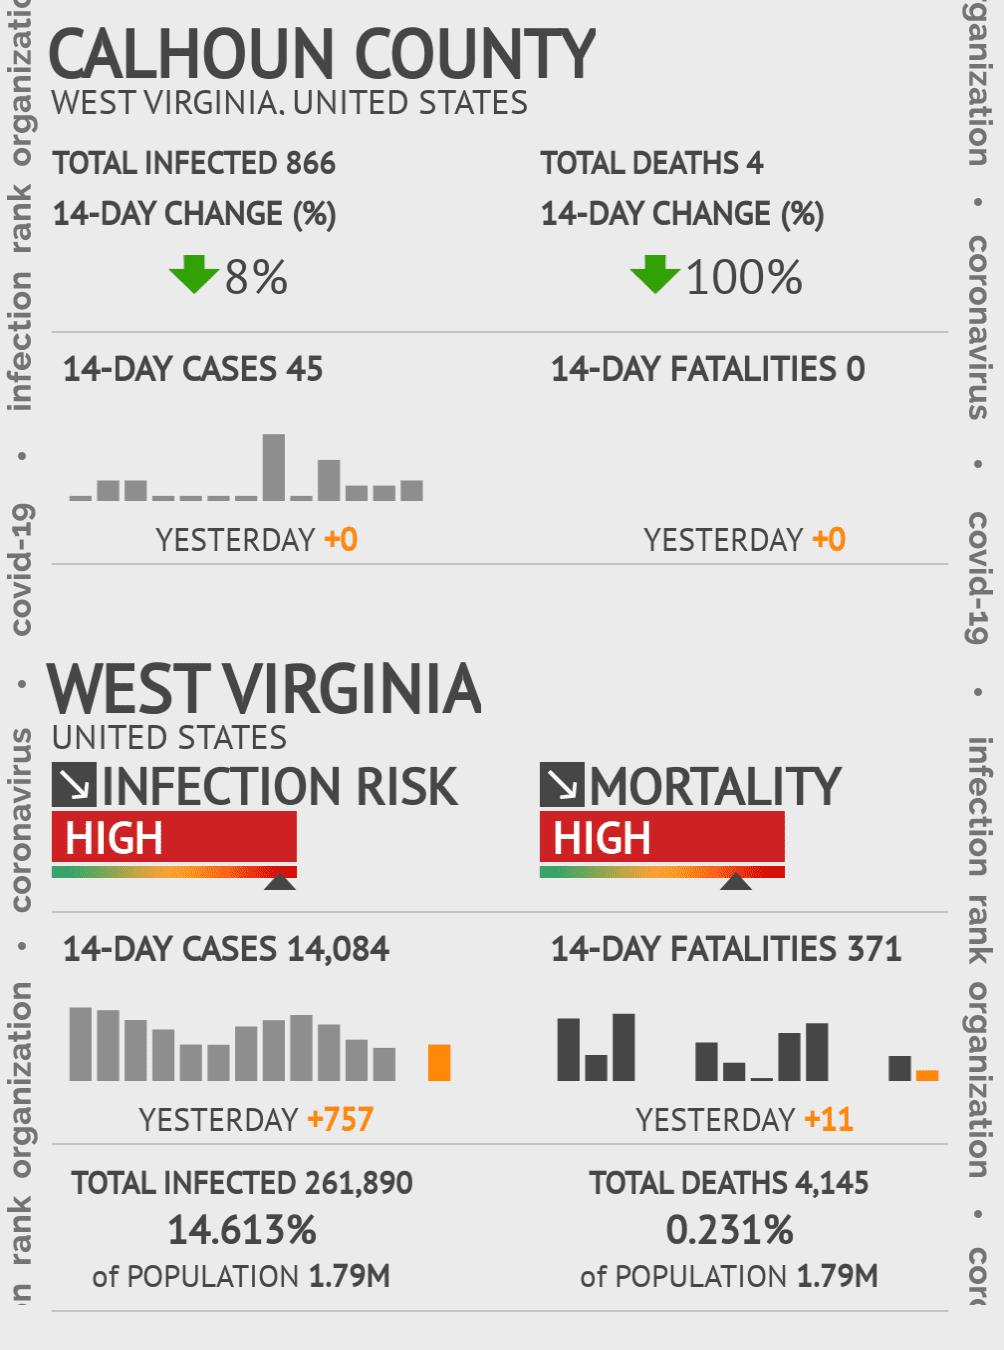 Calhoun County Coronavirus Covid-19 Risk of Infection on March 23, 2021